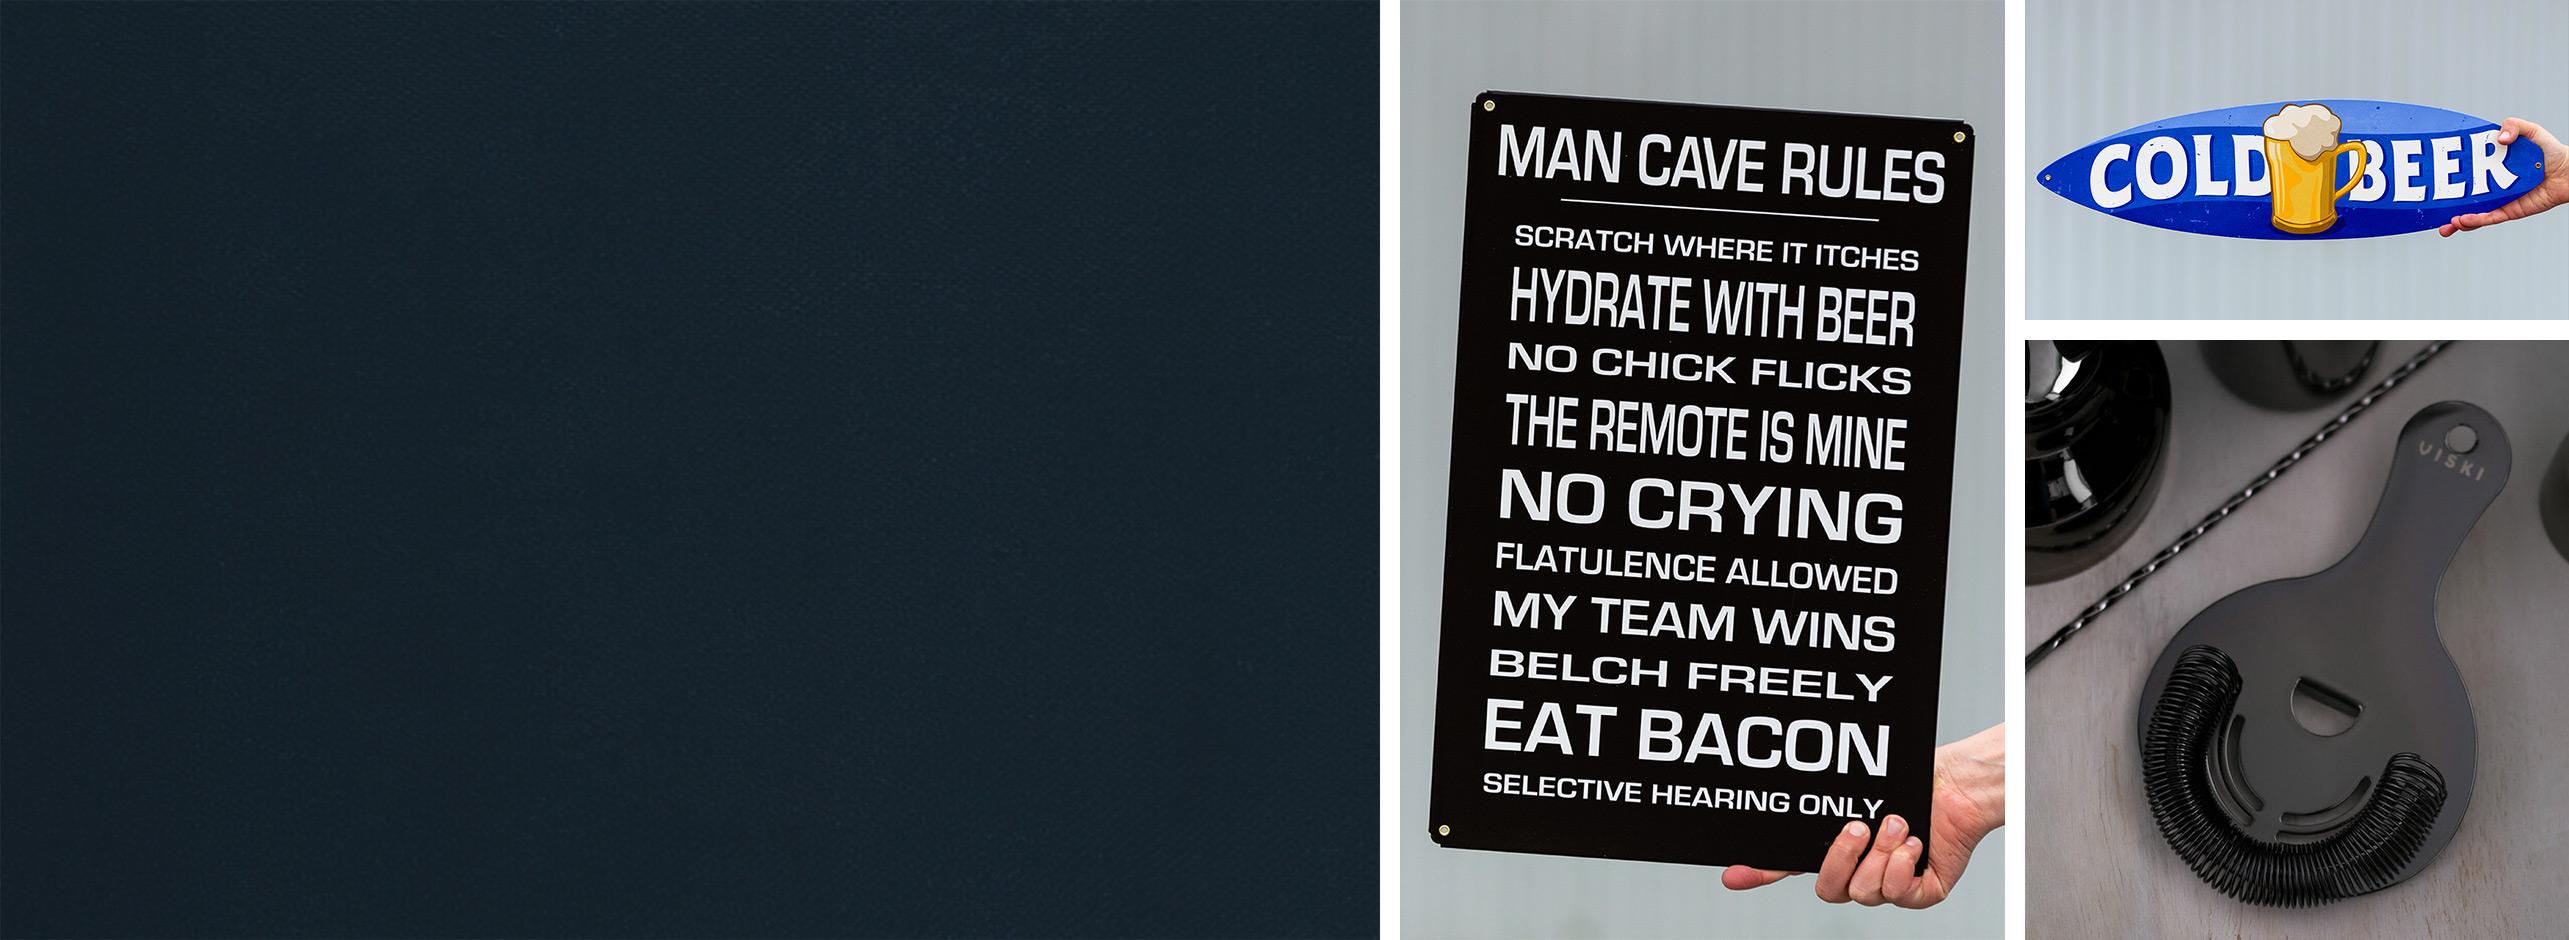 $10 Off $50+ Man Cave Must-Haves - MANCAVEMASTER